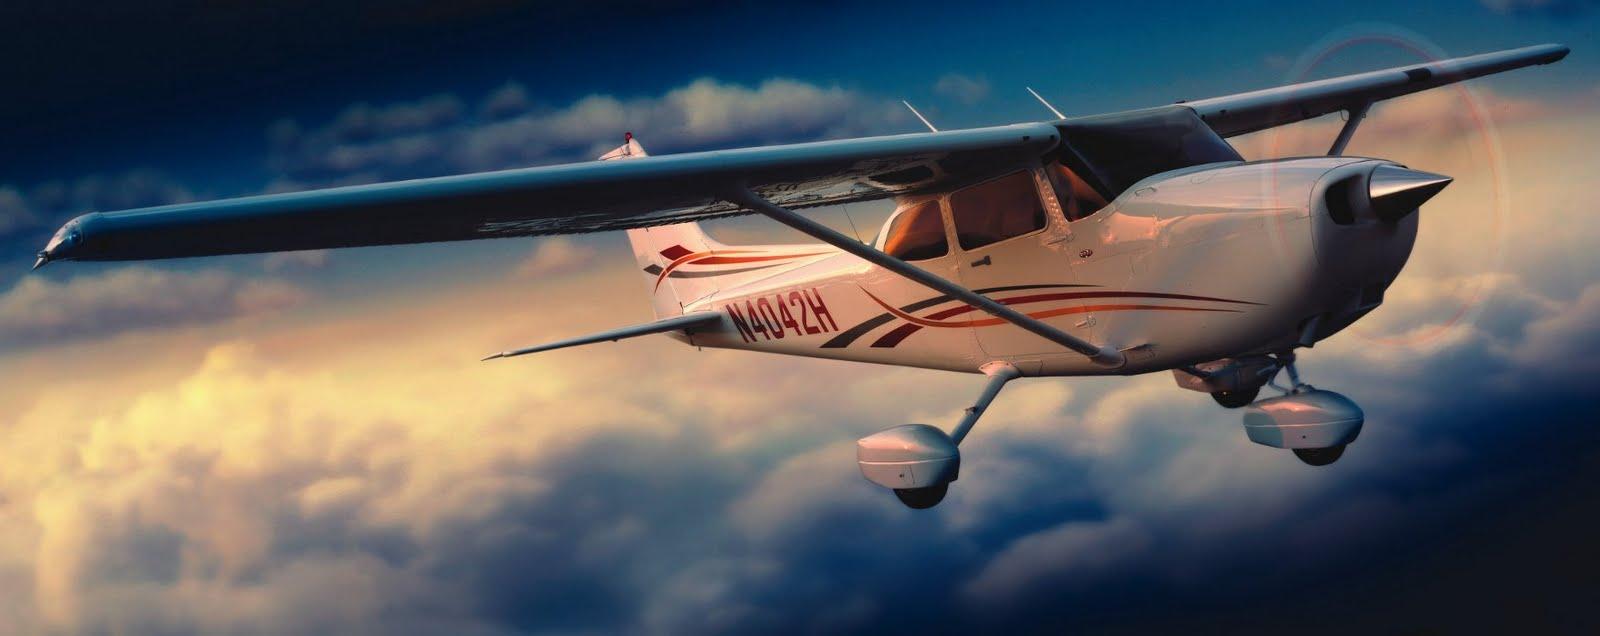 helicopter rides es with Cessna 172 Skyhawk on Burj khalifa aka burj dubai Wallpapers additionally 7 Spektakulaersten Skywalks furthermore Worlds Biggest Diamond Mine also Watch likewise Cessna 172 Skyhawk.